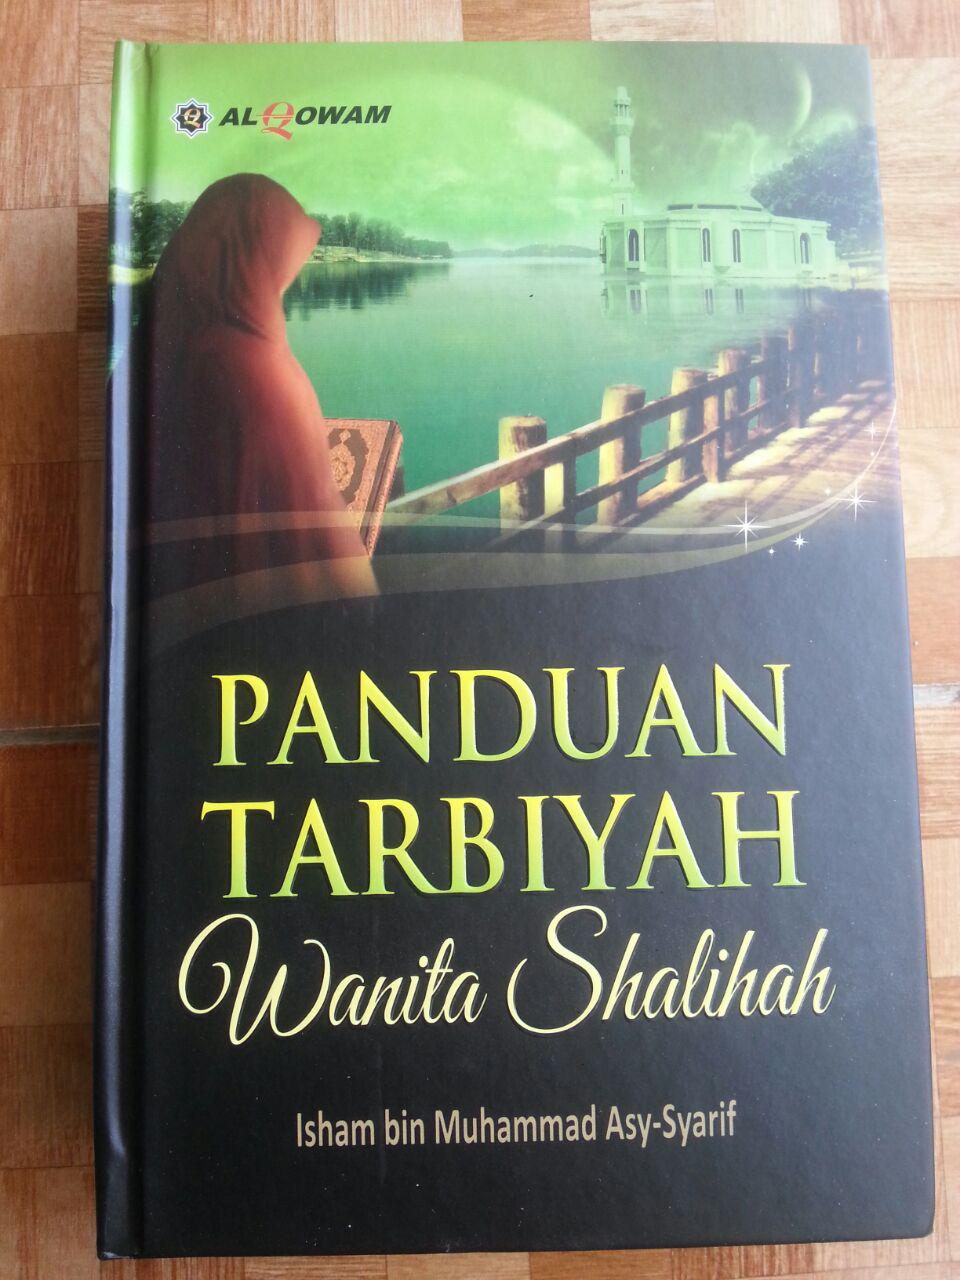 Buku Panduan Tarbiyah Wanita Shalihah cover 2